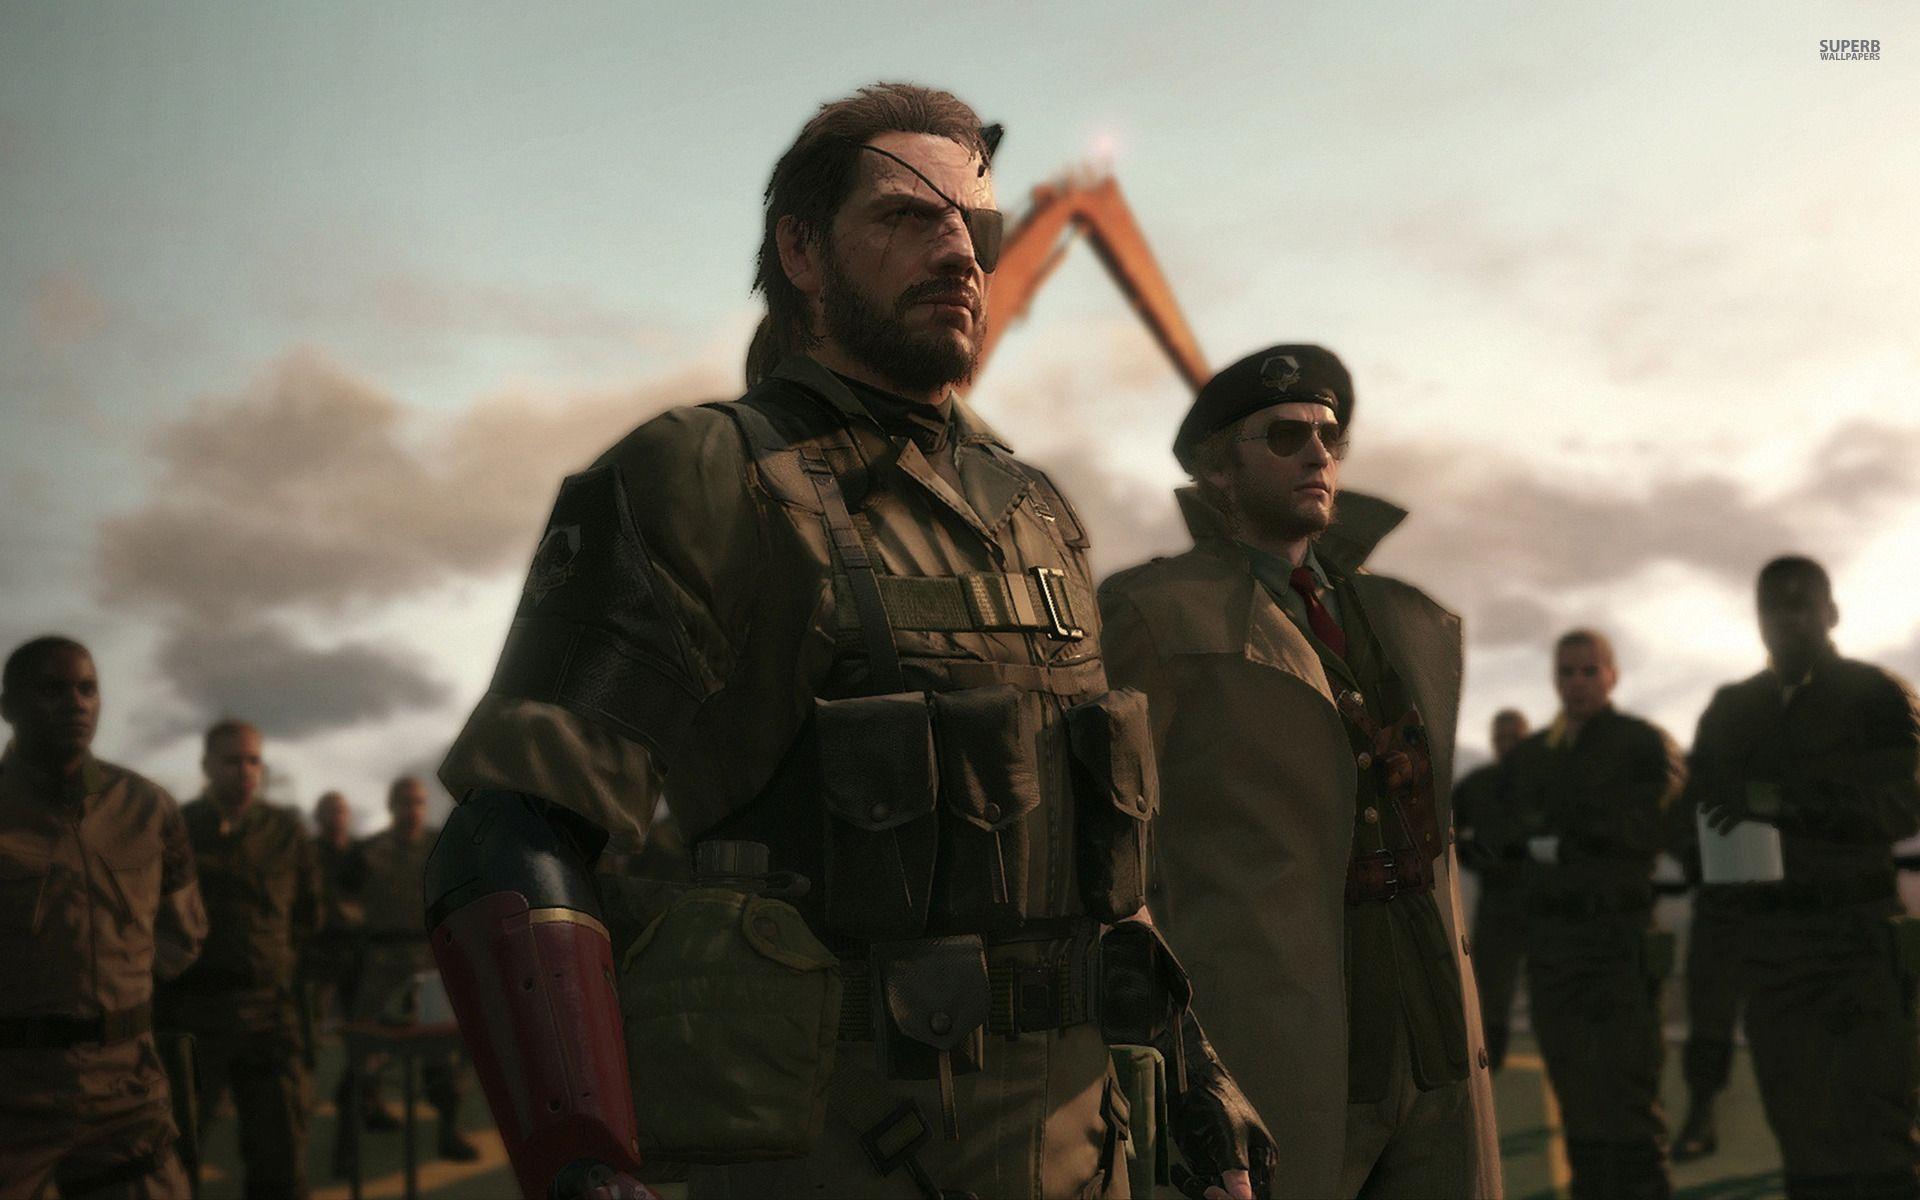 Metal Gear Solid Wallpapers – Full HD wallpaper search